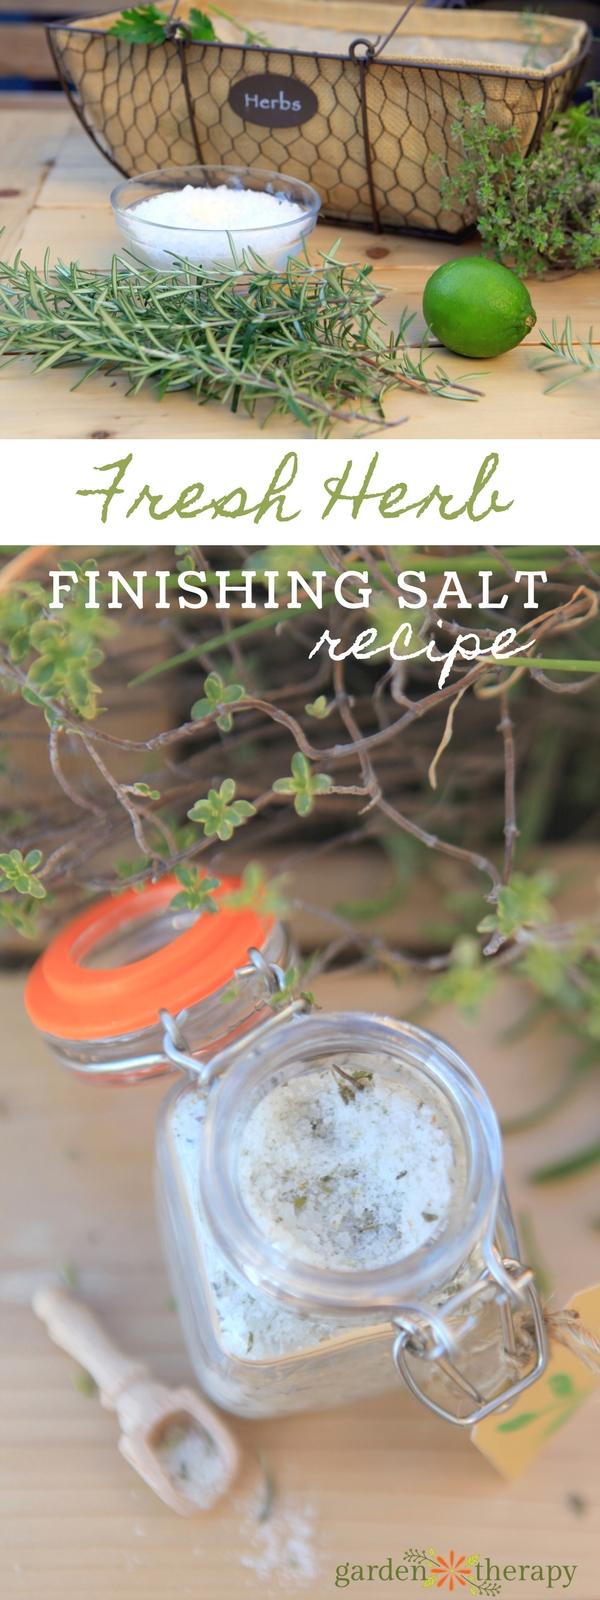 Finishing salt made with fresh garden herbs